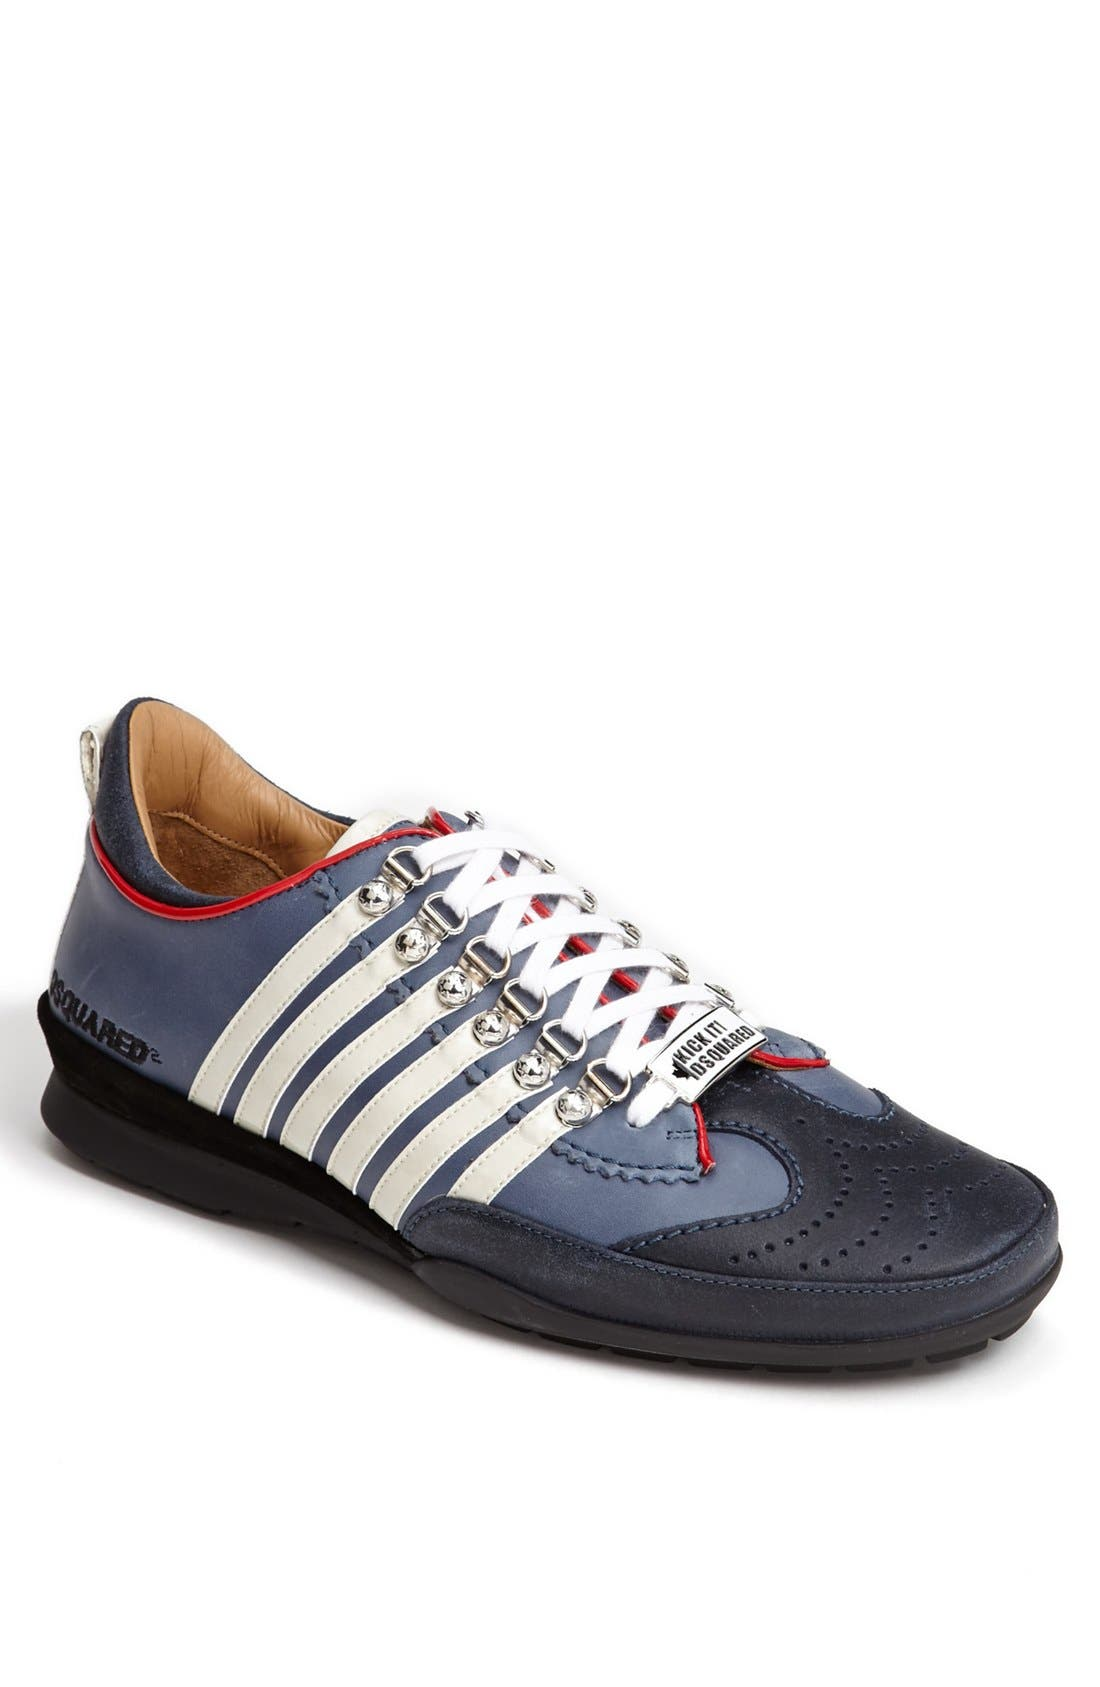 Main Image - Dsquared2 '251' Sneaker